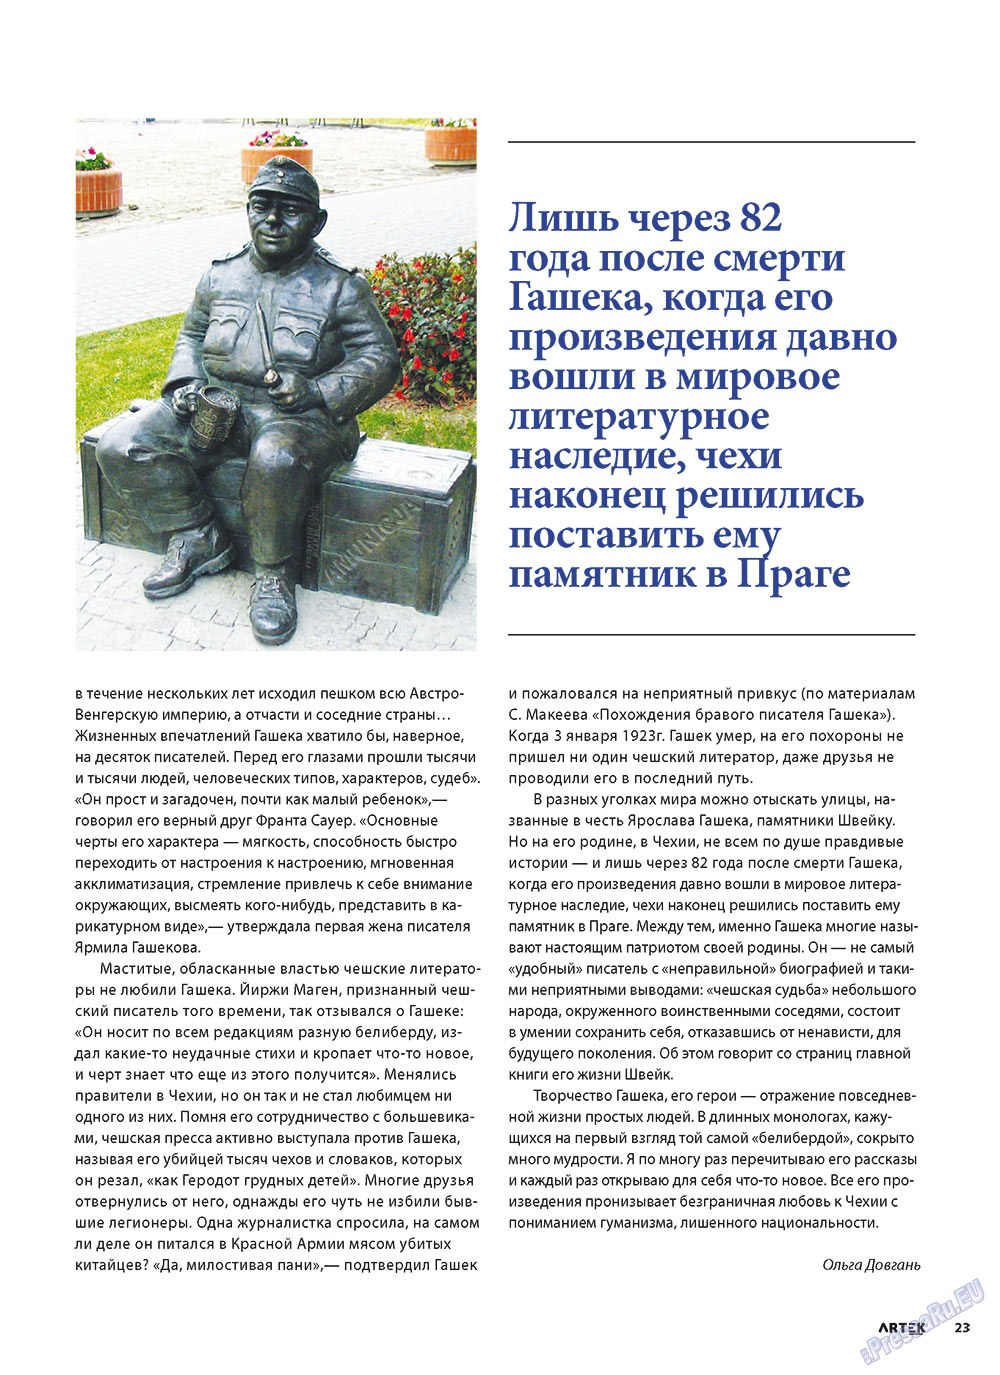 Артек (журнал). 2011 год, номер 1, стр. 25